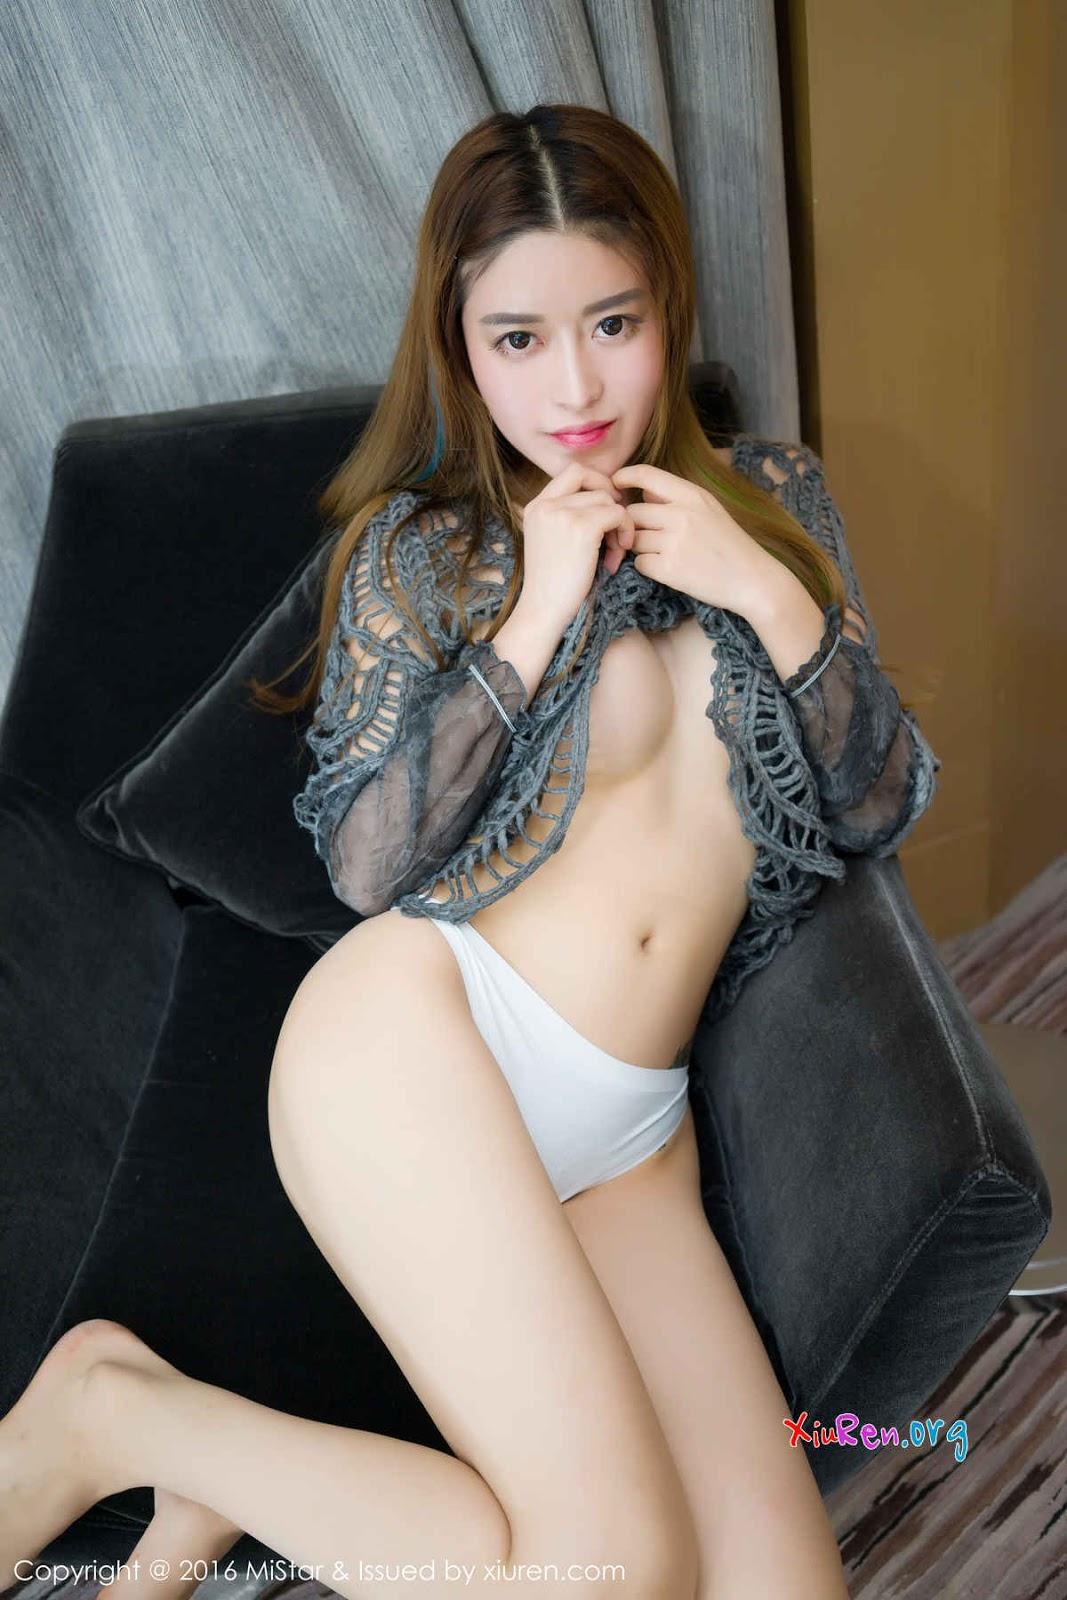 https://2.bp.blogspot.com/-OWSAs_ZpMhM/WHrzw6jTg1I/AAAAAAAAO0s/75VICxneWU067ez1ko-8LHt5PFjvnVoqQCLcB/s1600/xinh-sexy-10.jpg